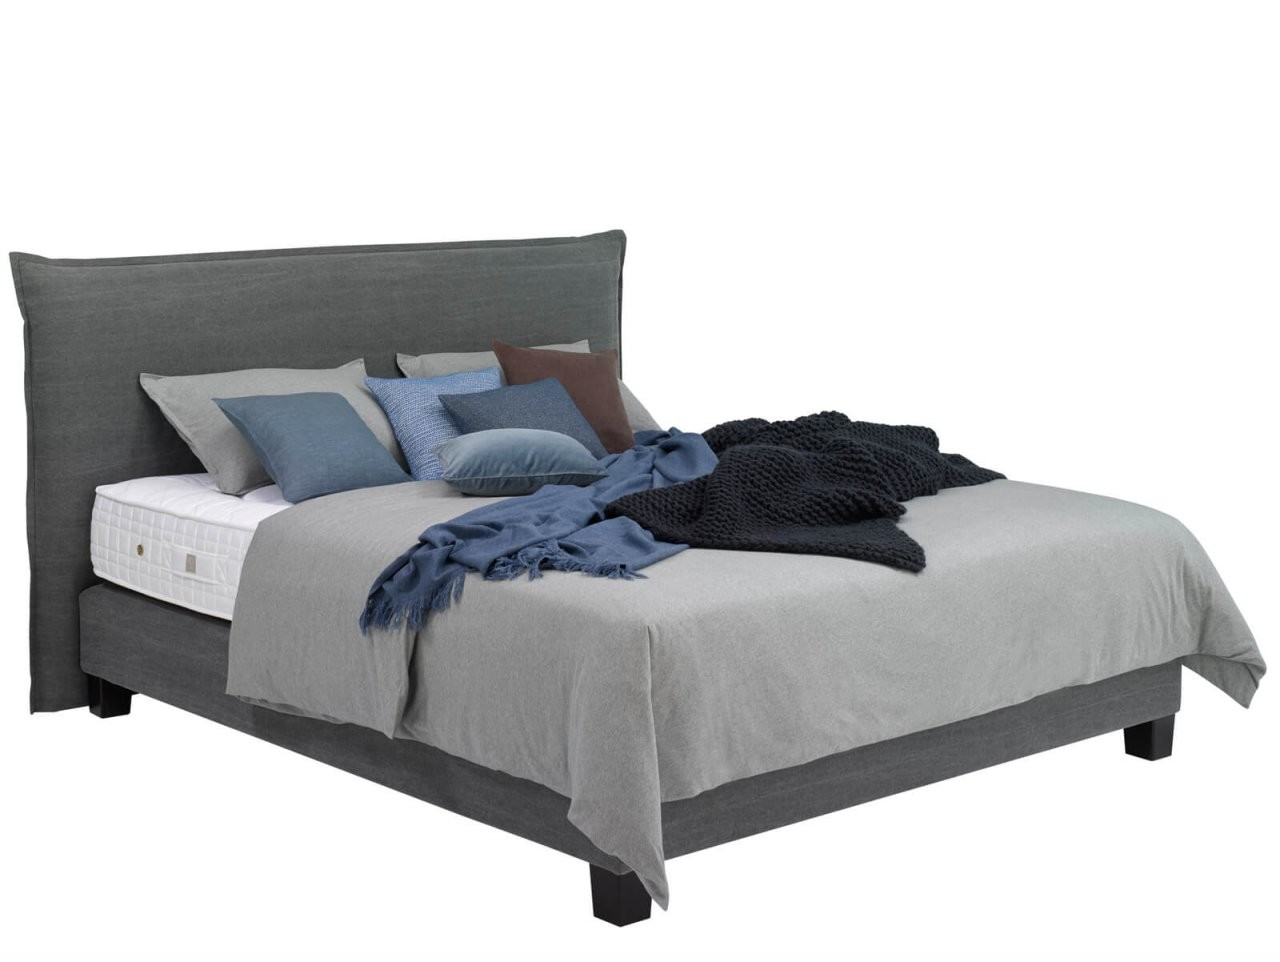 Treca 24Seven Smart  Boxspringbetten  Sleeping Art Schlafkonzepte von Boxspringbett Santa Barbara - Grau - 180X200 Cm Bild